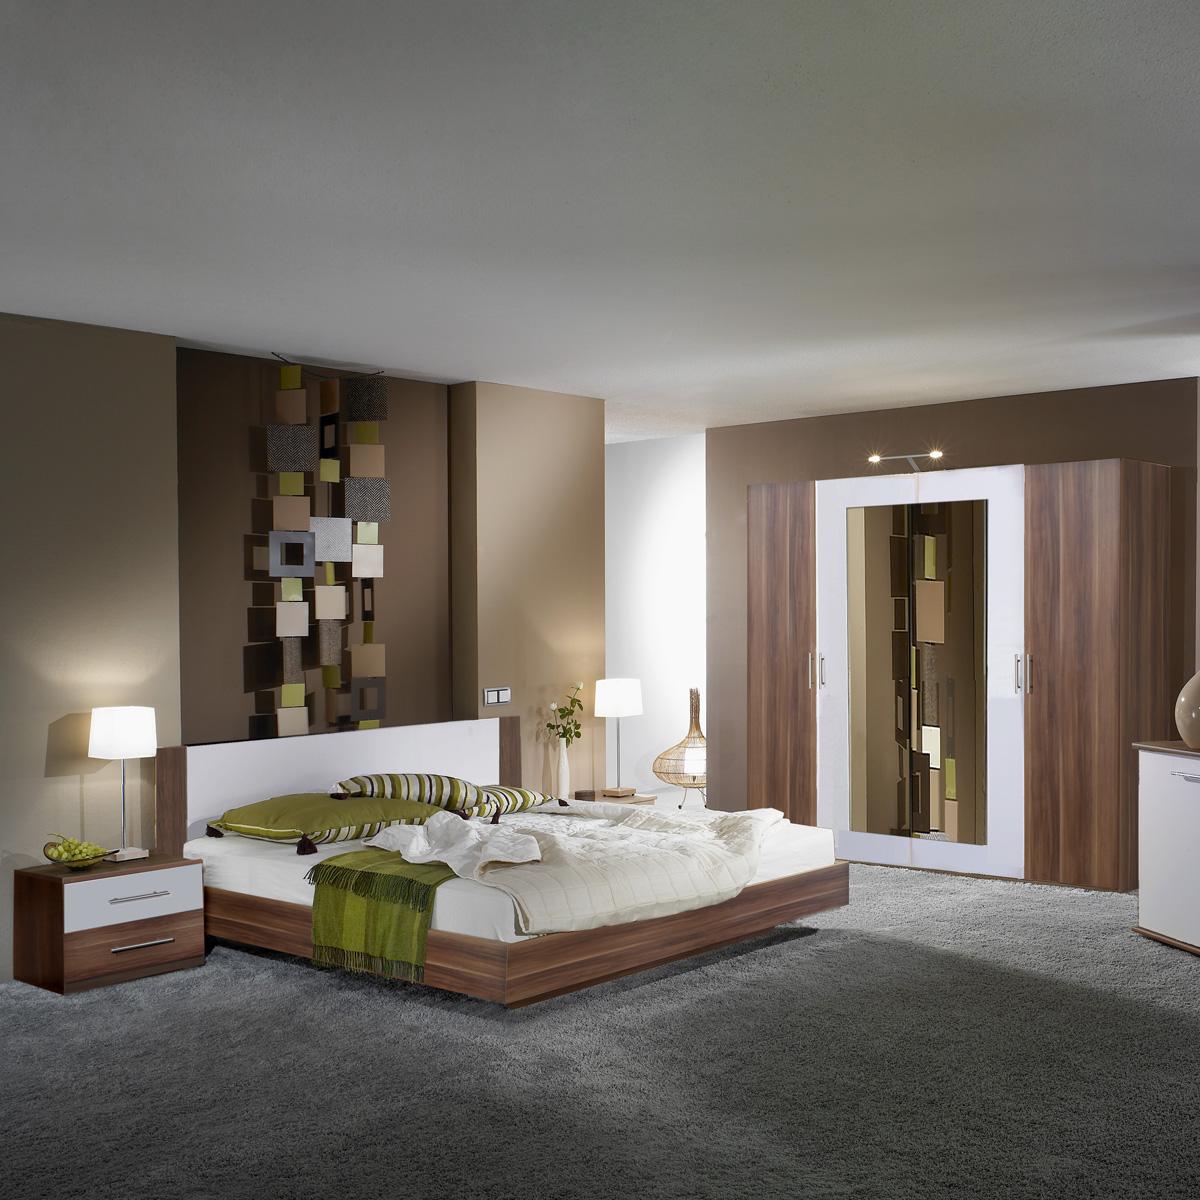 Schlafzimmer Set Ideen Modern